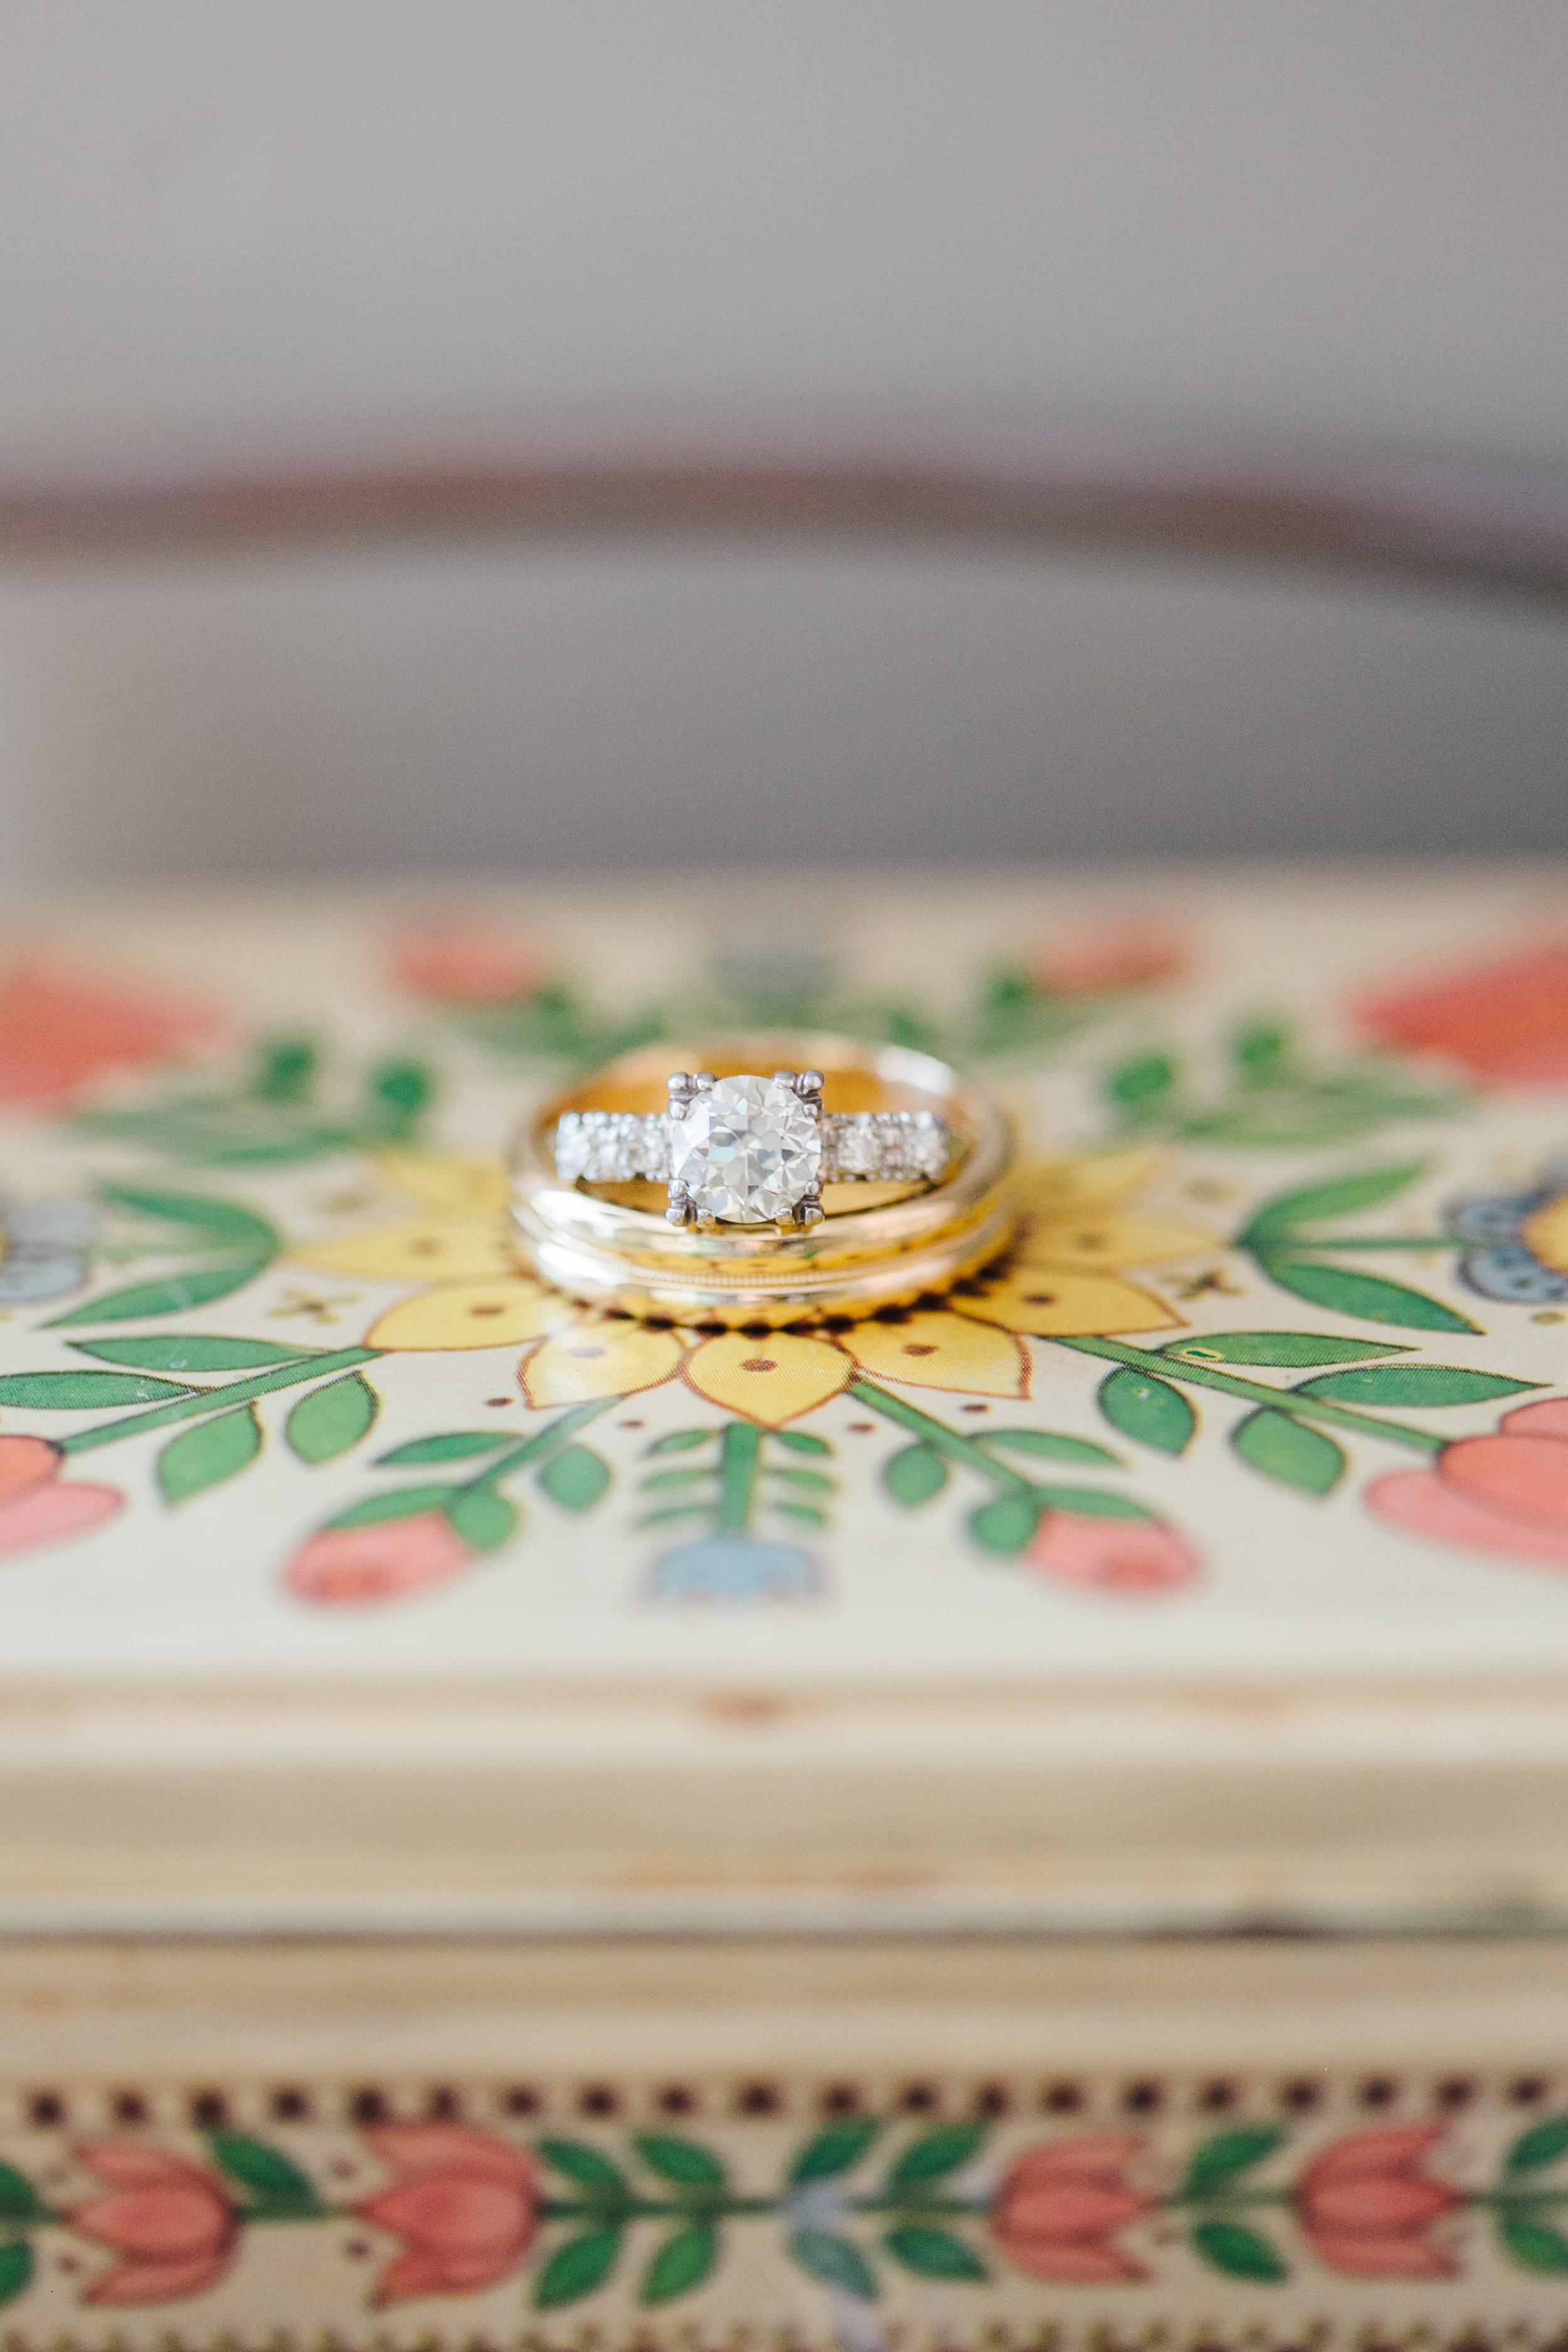 Engagement and Wedding Rings Little Thompson Valley Pioneer Museum Berthoud Colorado Wedding